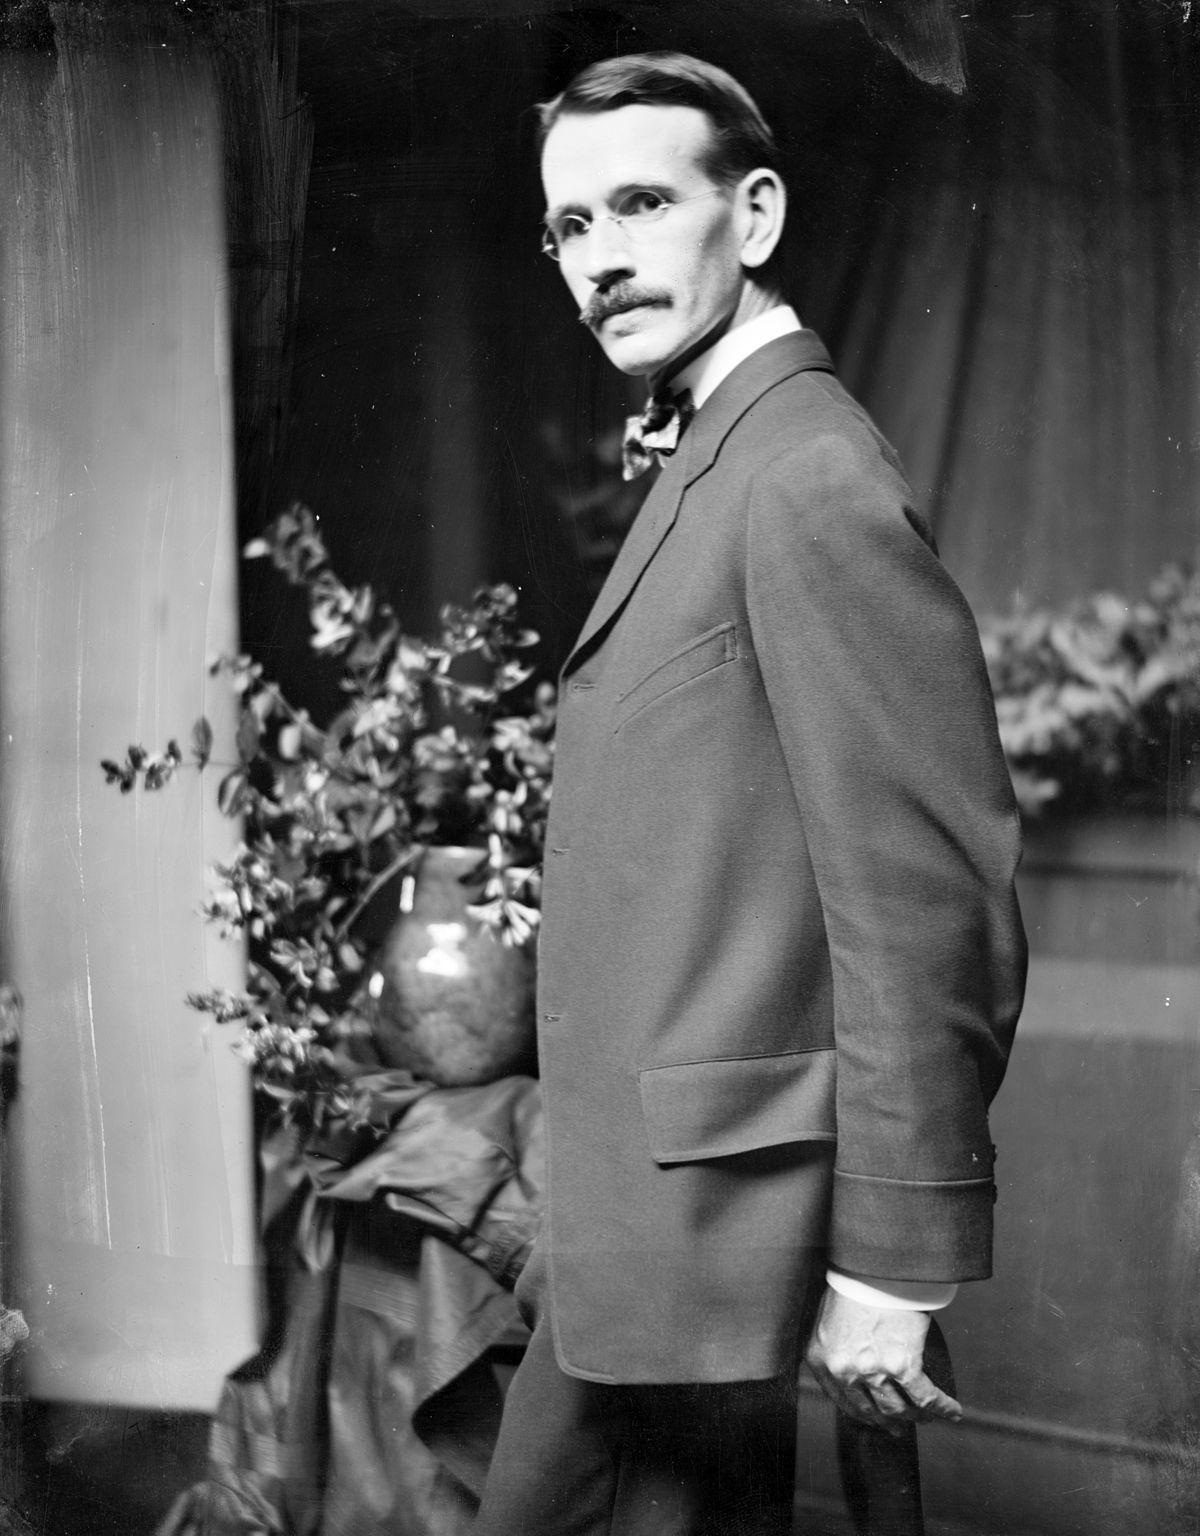 Arthur Bowen